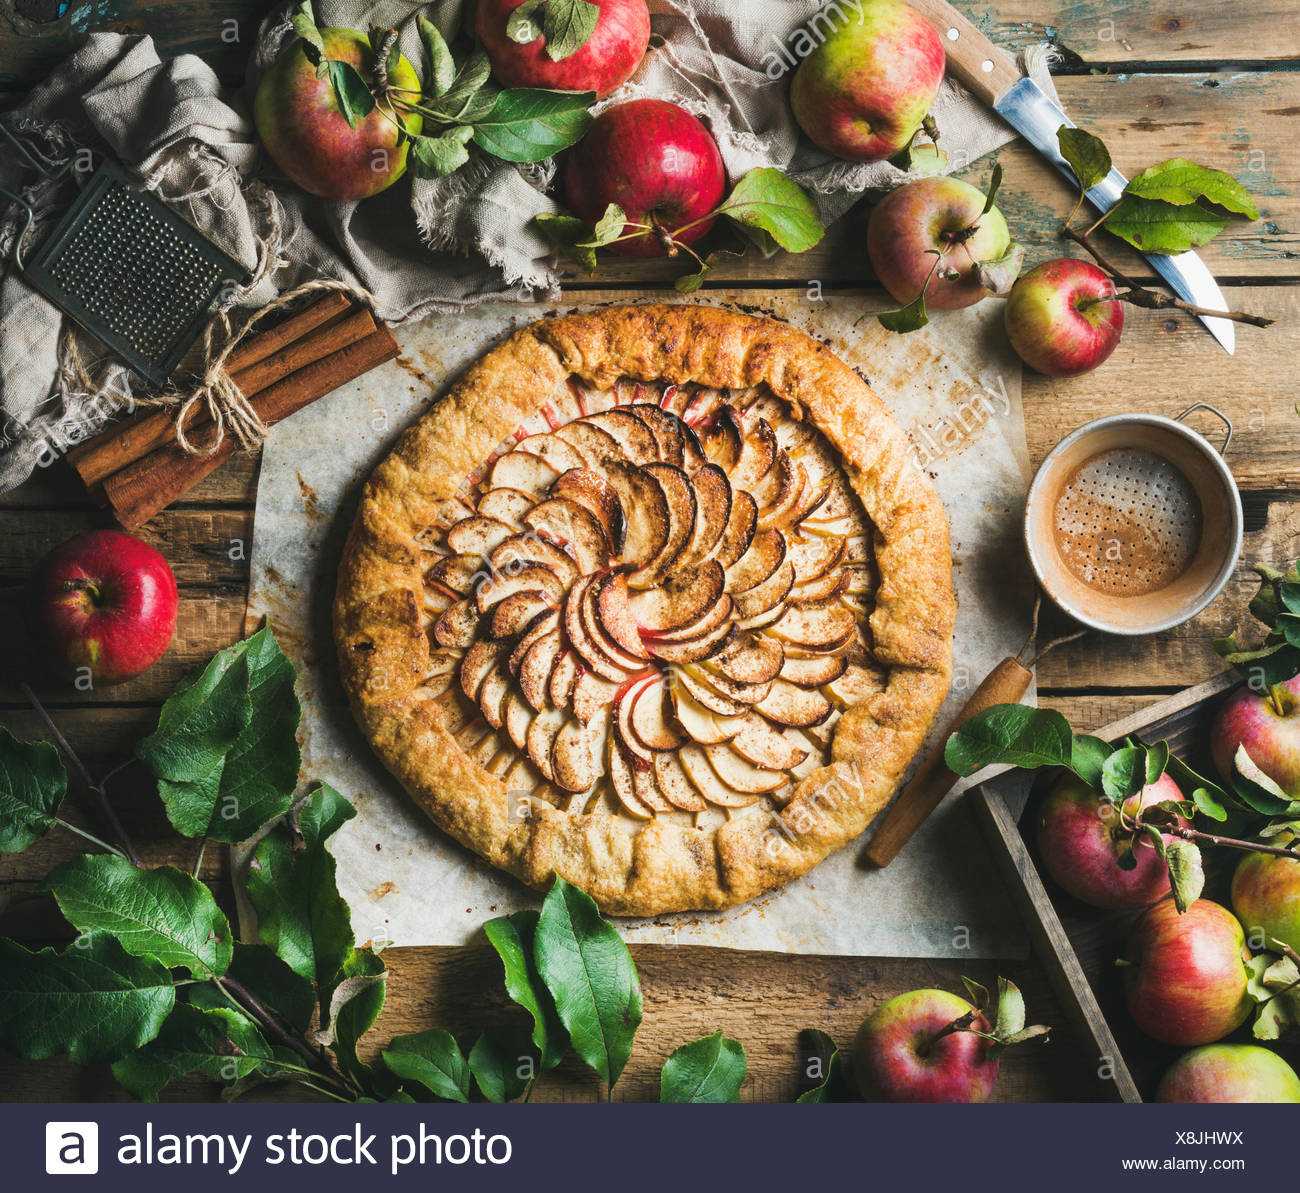 Crostata tarta de manzana con canela servidos con jardín fresco manzanas con hojas sobre fondo de madera rústica, vista superior, horizontal c Imagen De Stock